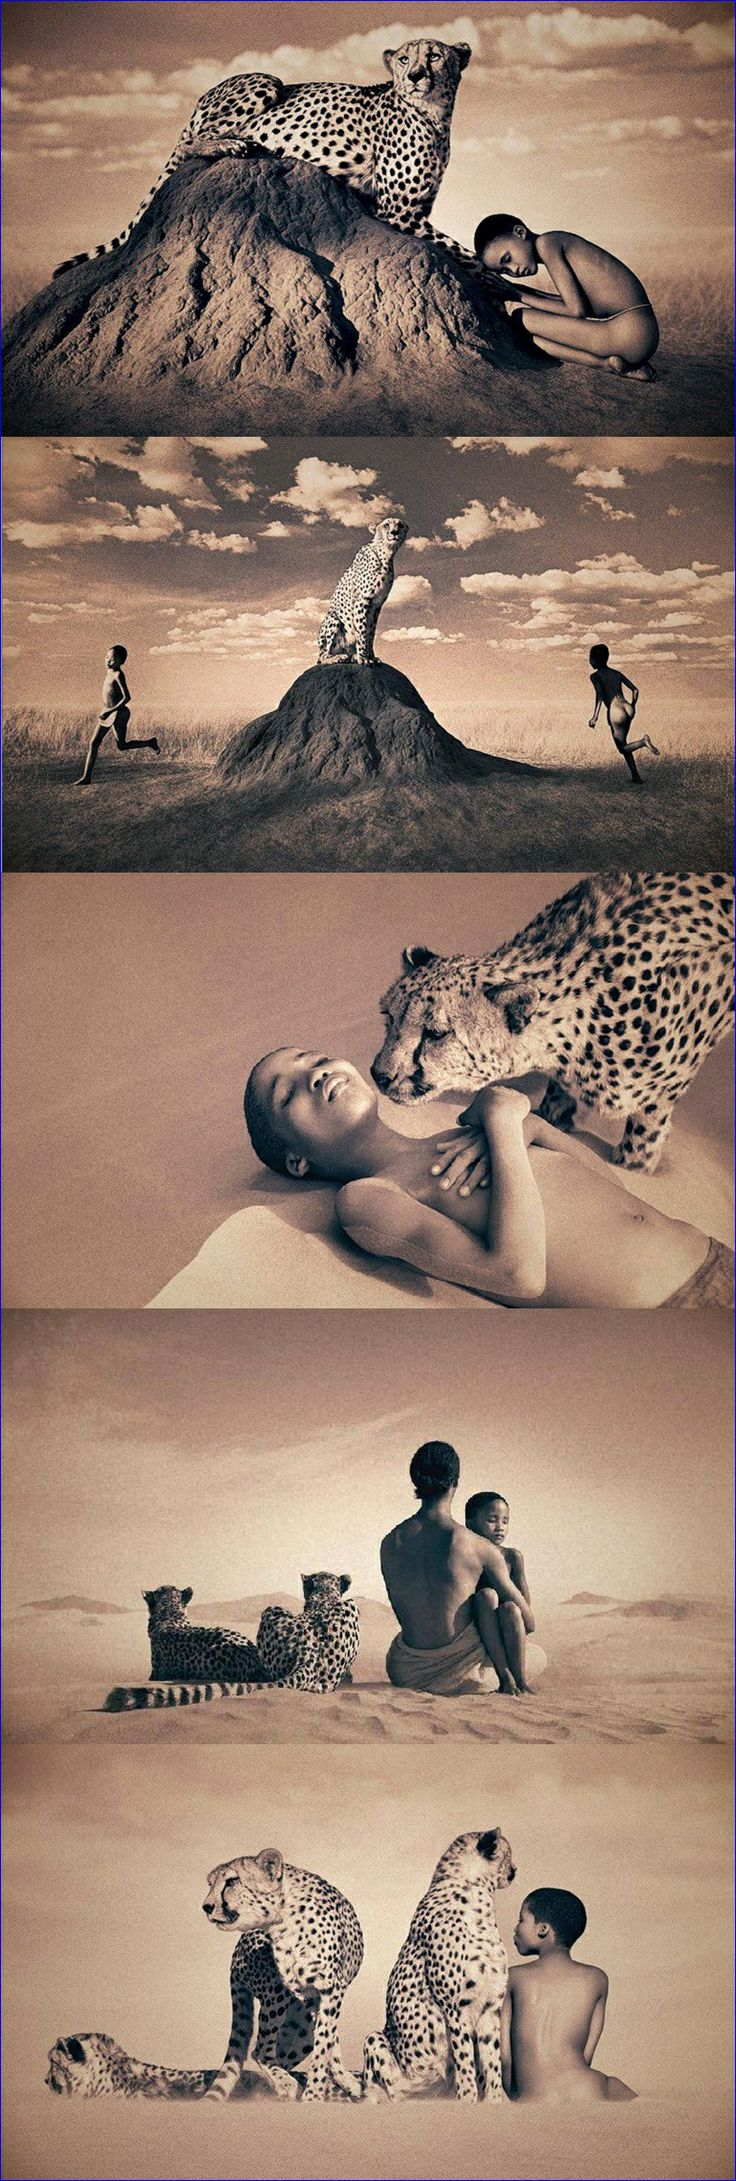 357 Best Art Cheetahs Images On Pinterest Big Cats Cheetahs And Nature